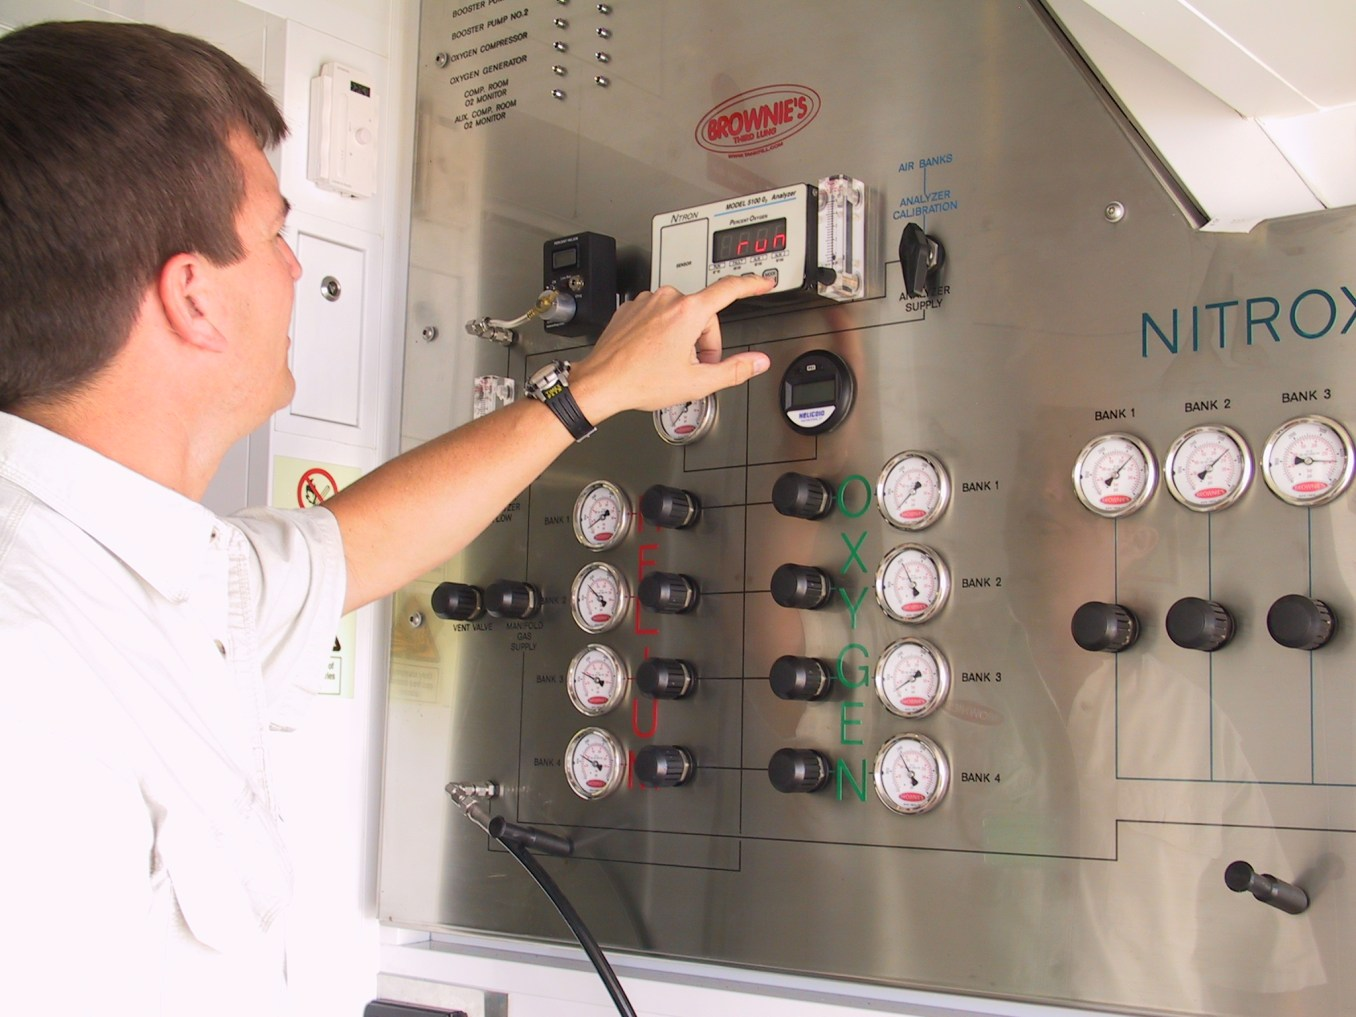 NitroxMaker™ Control Panel